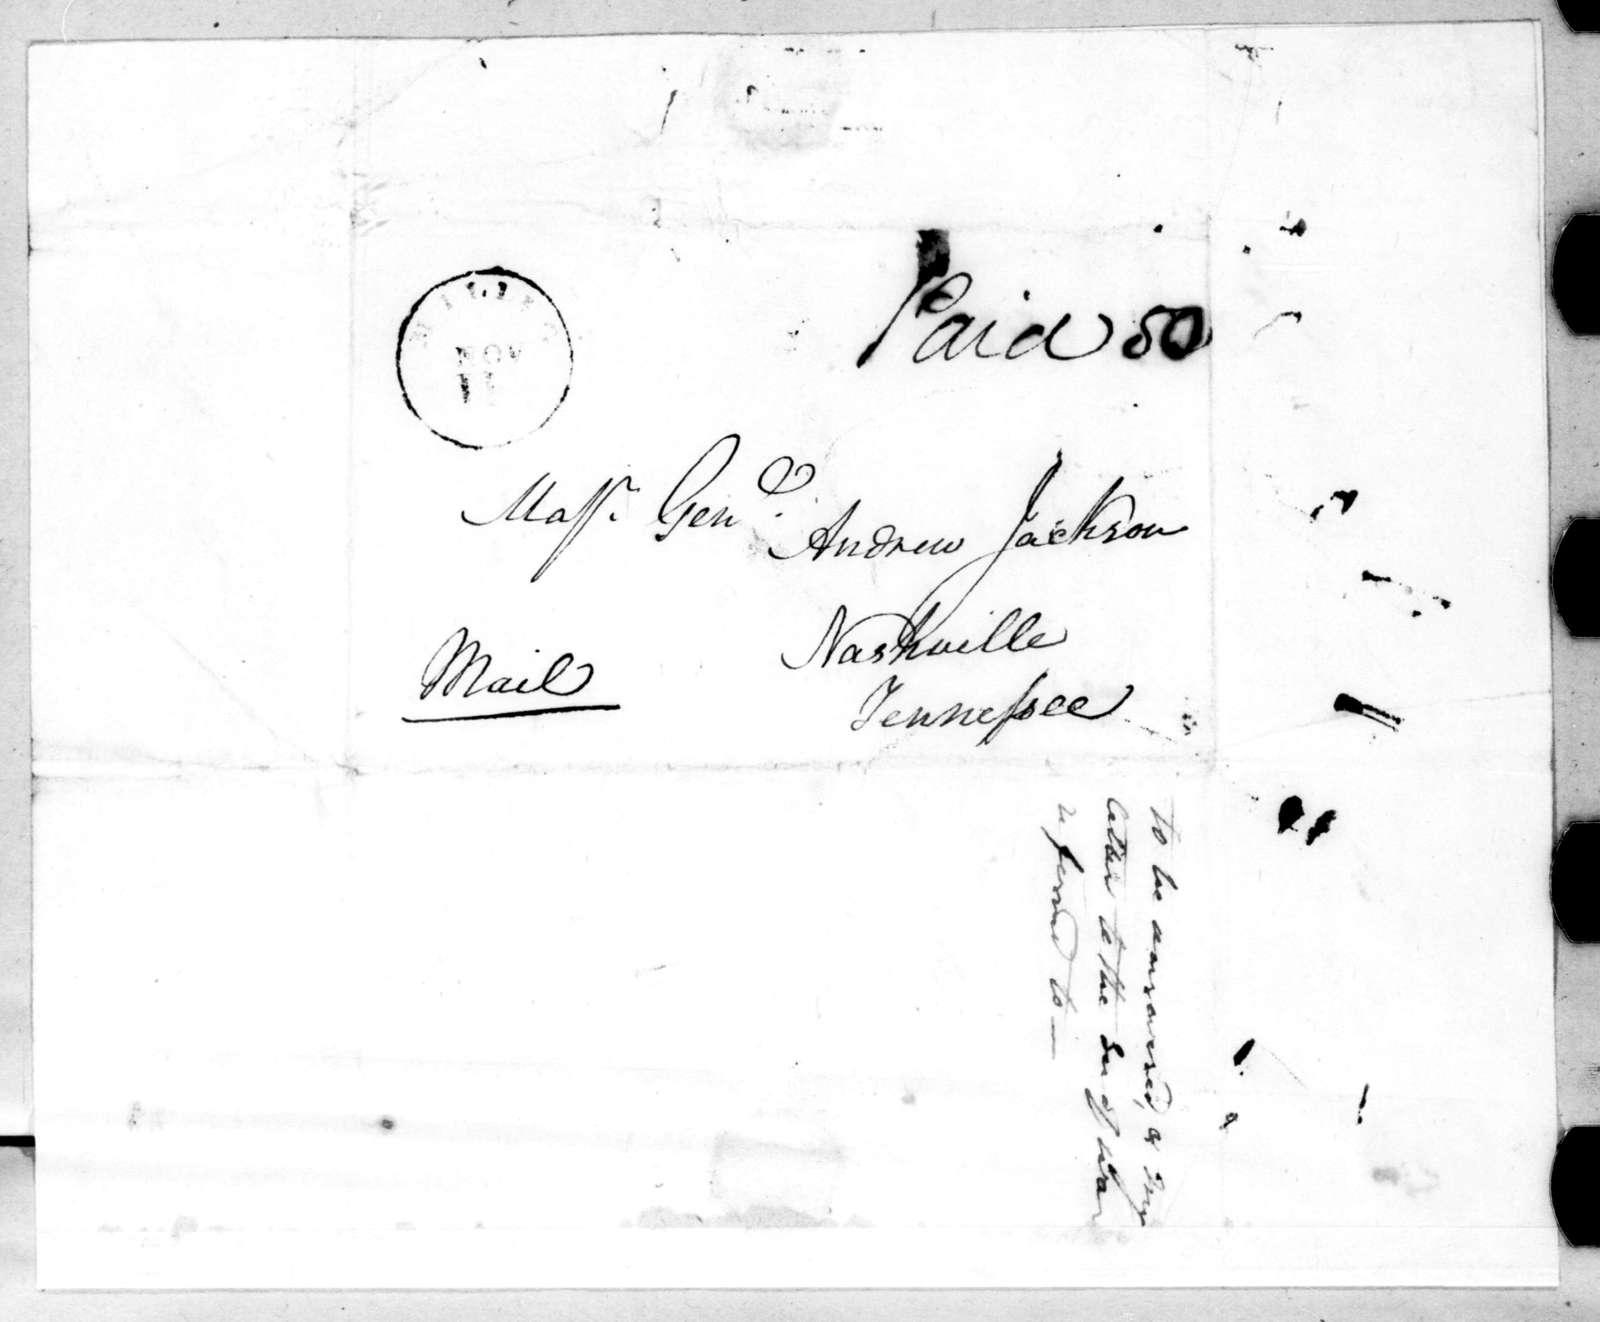 Thomas P. Carnes to Andrew Jackson, November 8, 1816